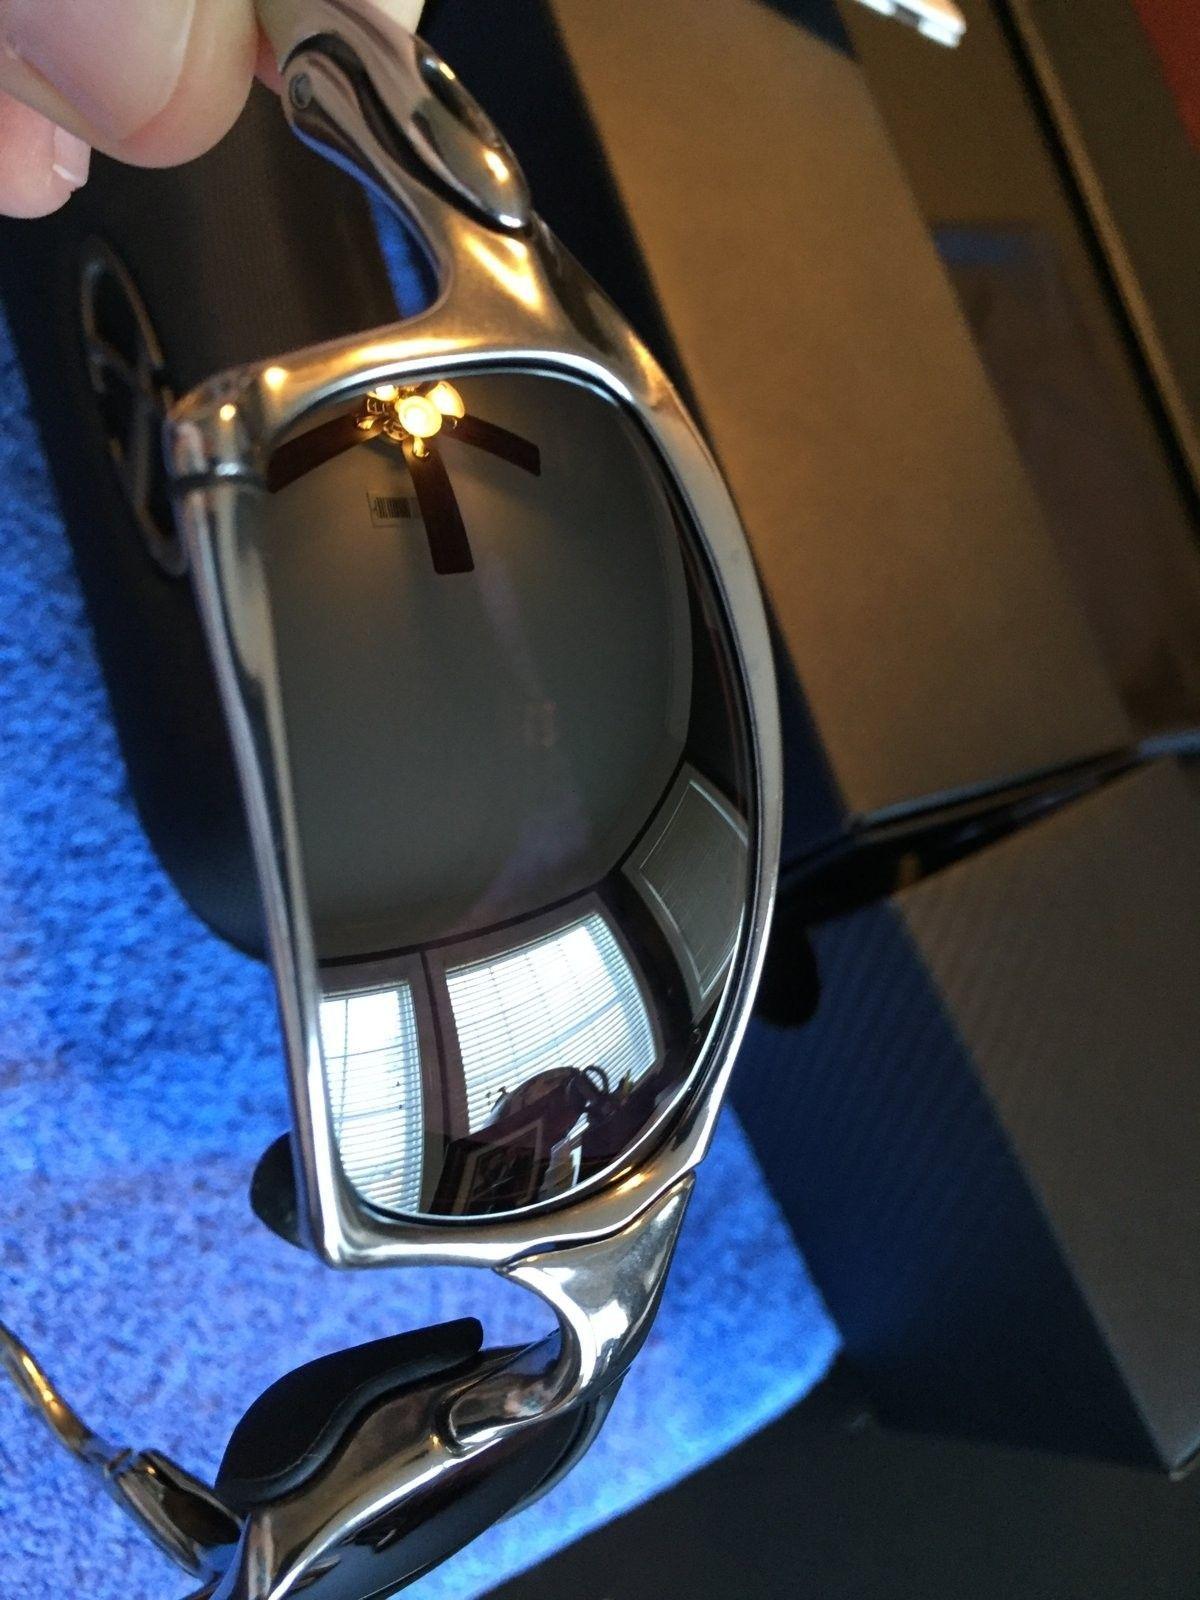 LNIB Polished XS/ VR28 lenses * Price drop* - IMG_1177.JPG